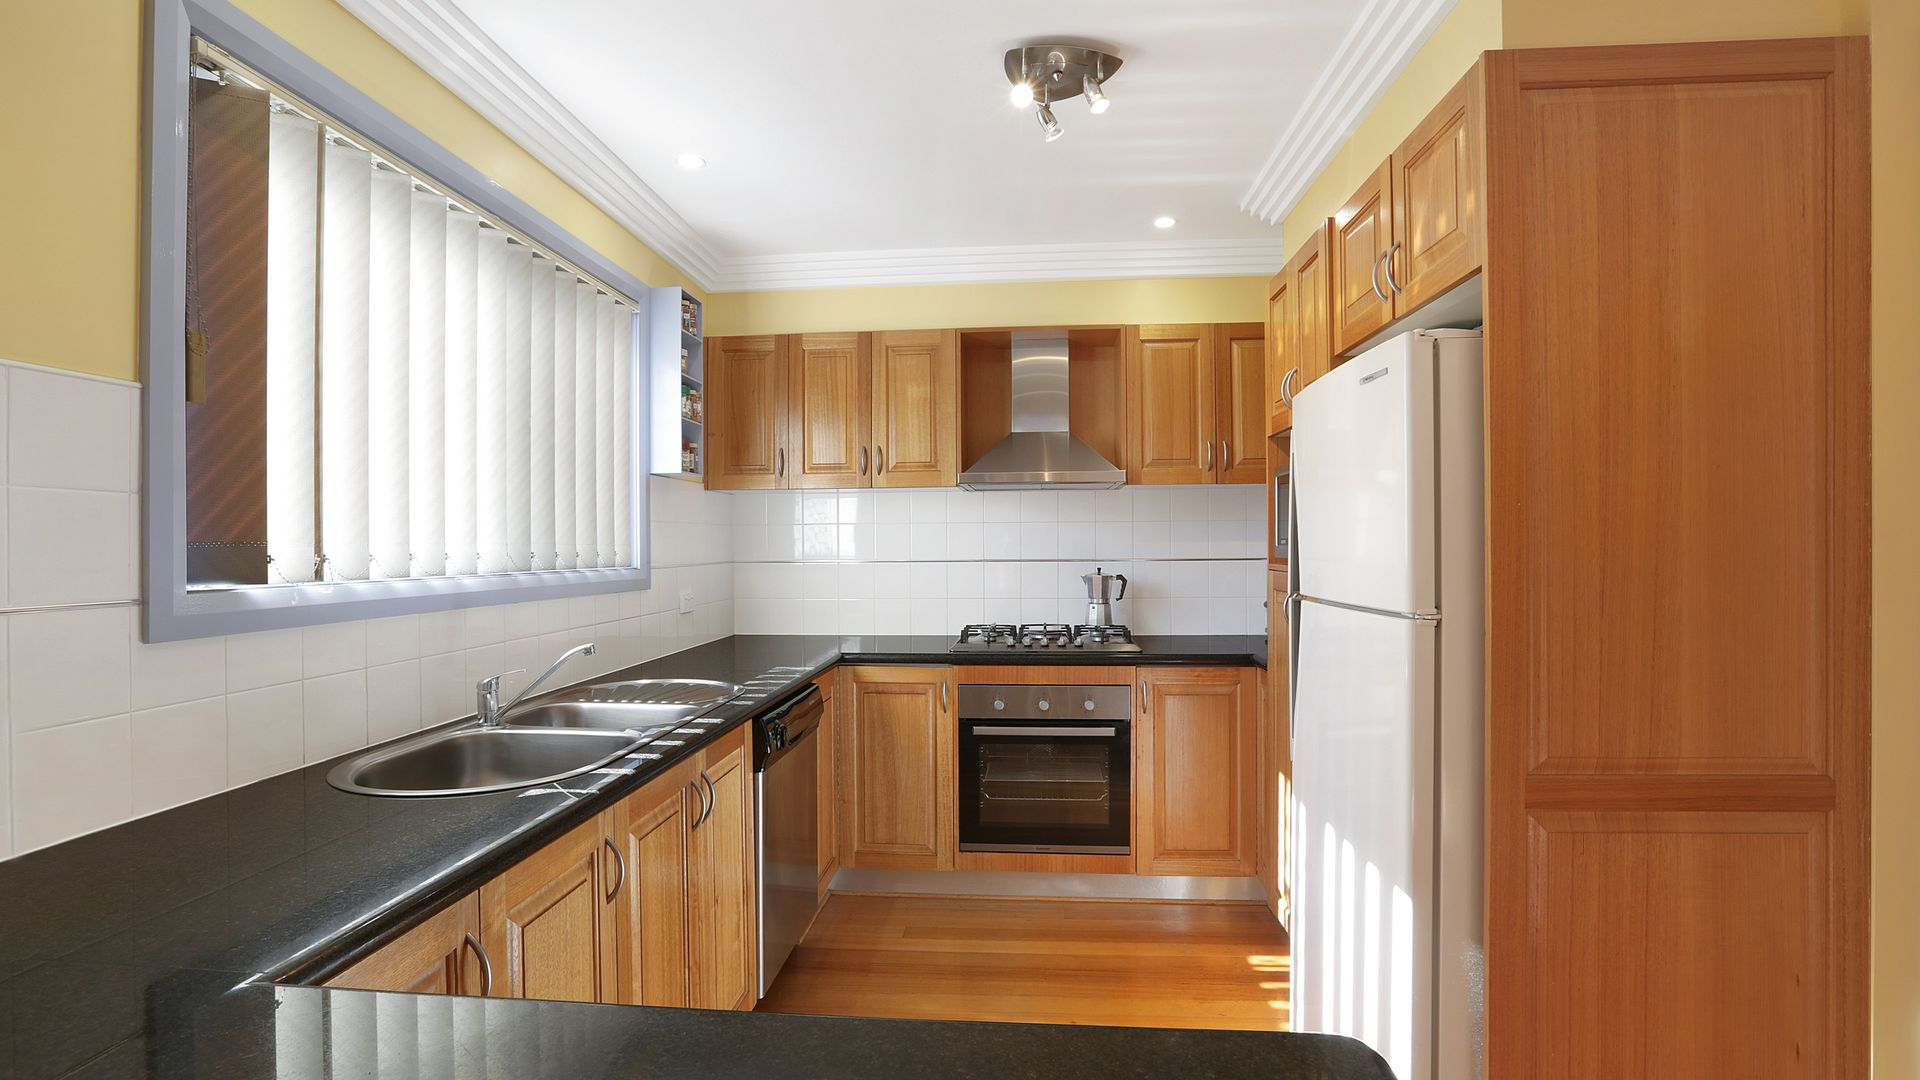 2/22 Matthews Street, Wollongong NSW 2500, Image 2